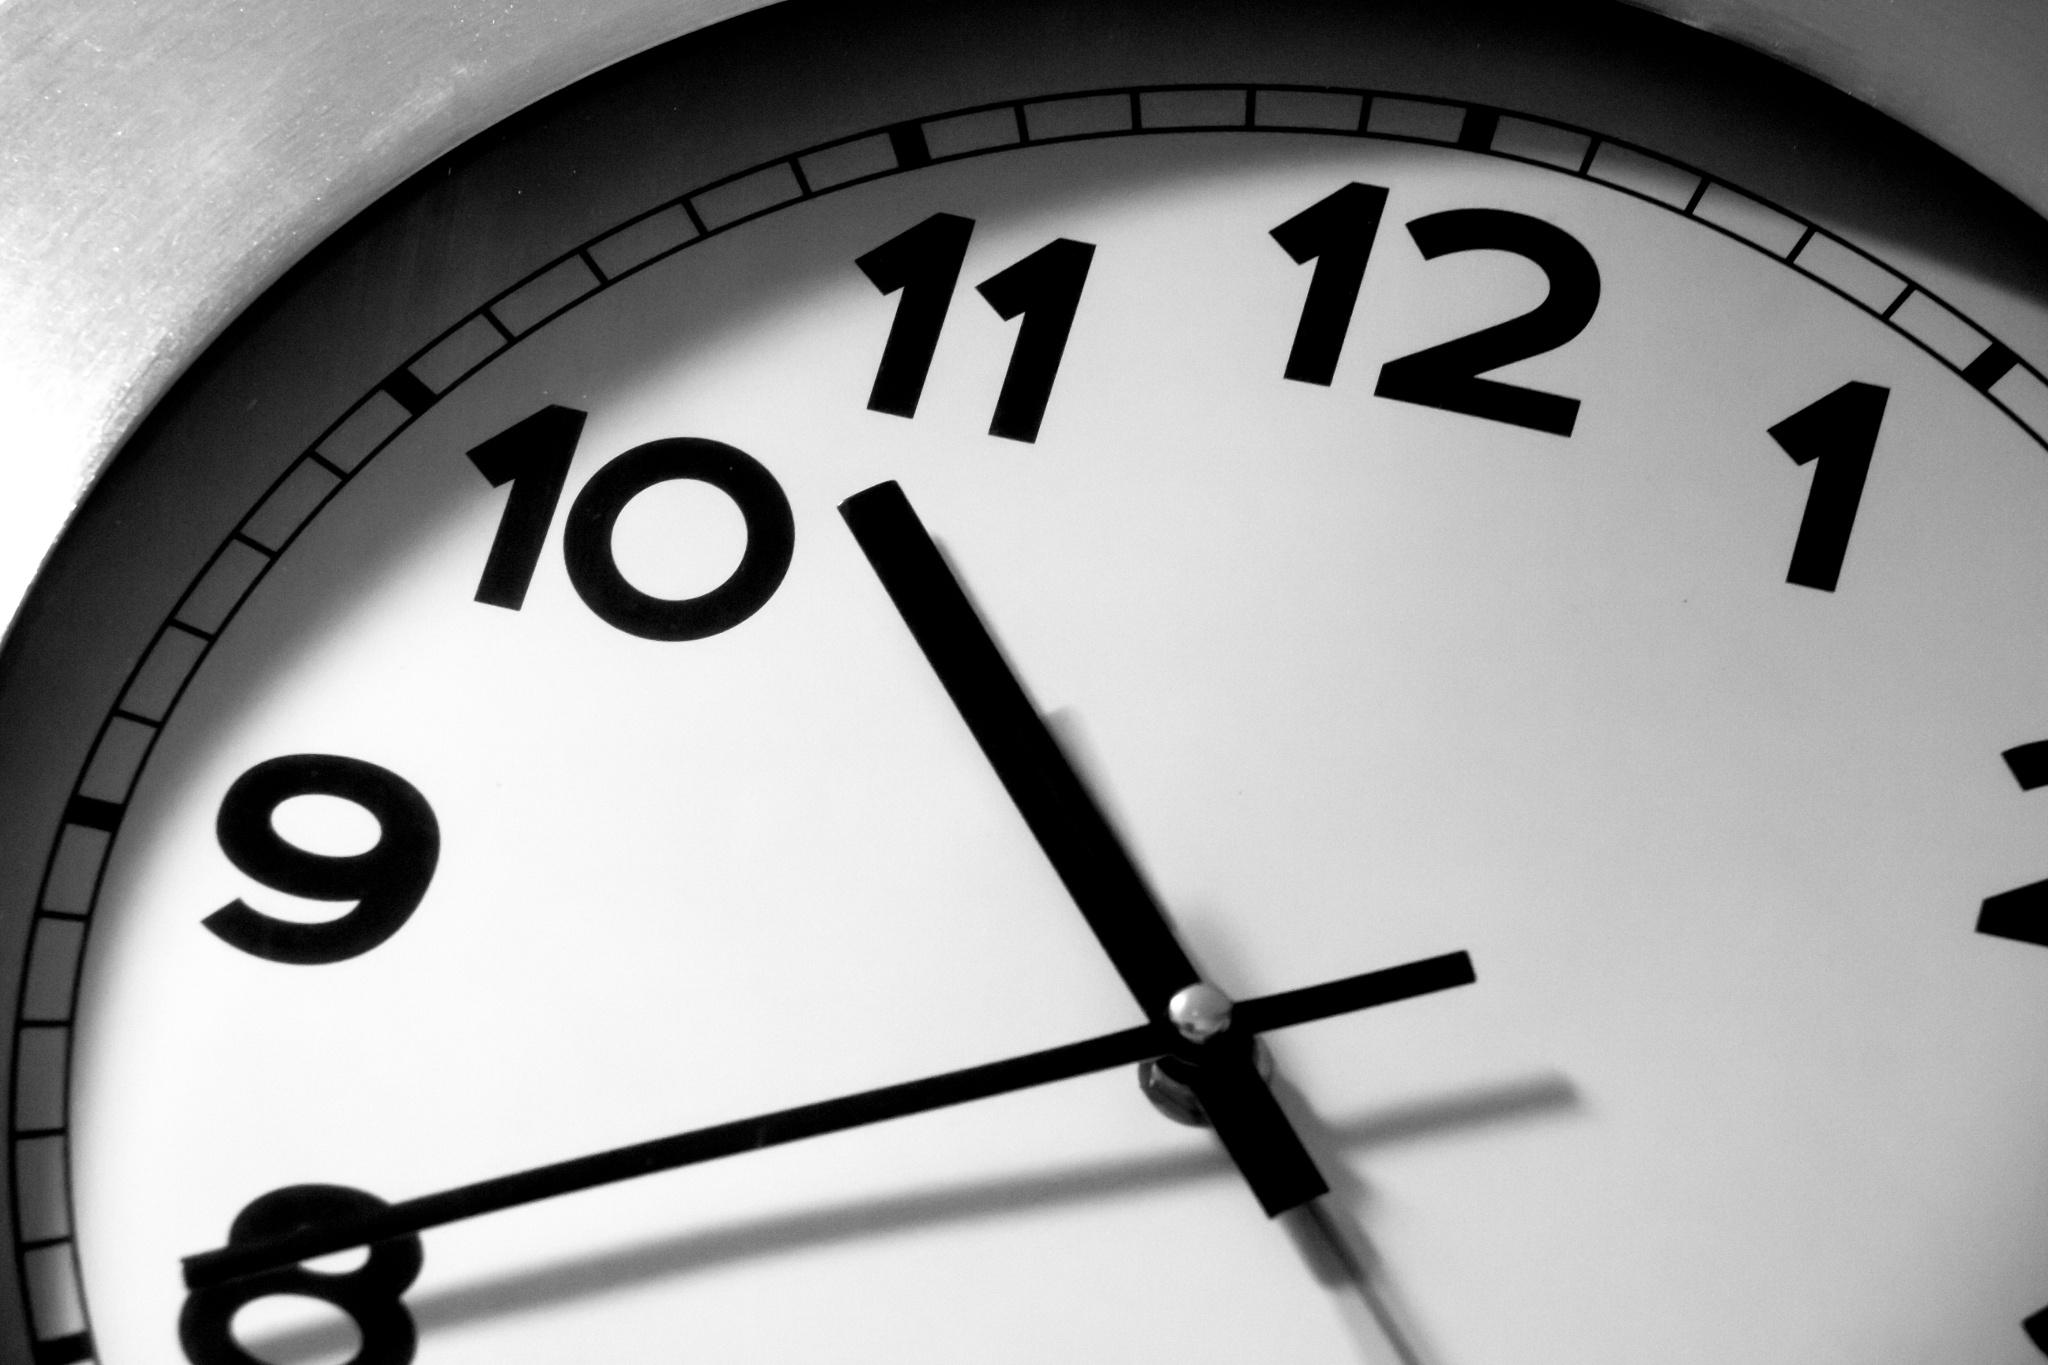 Time by Diogo Ferreira